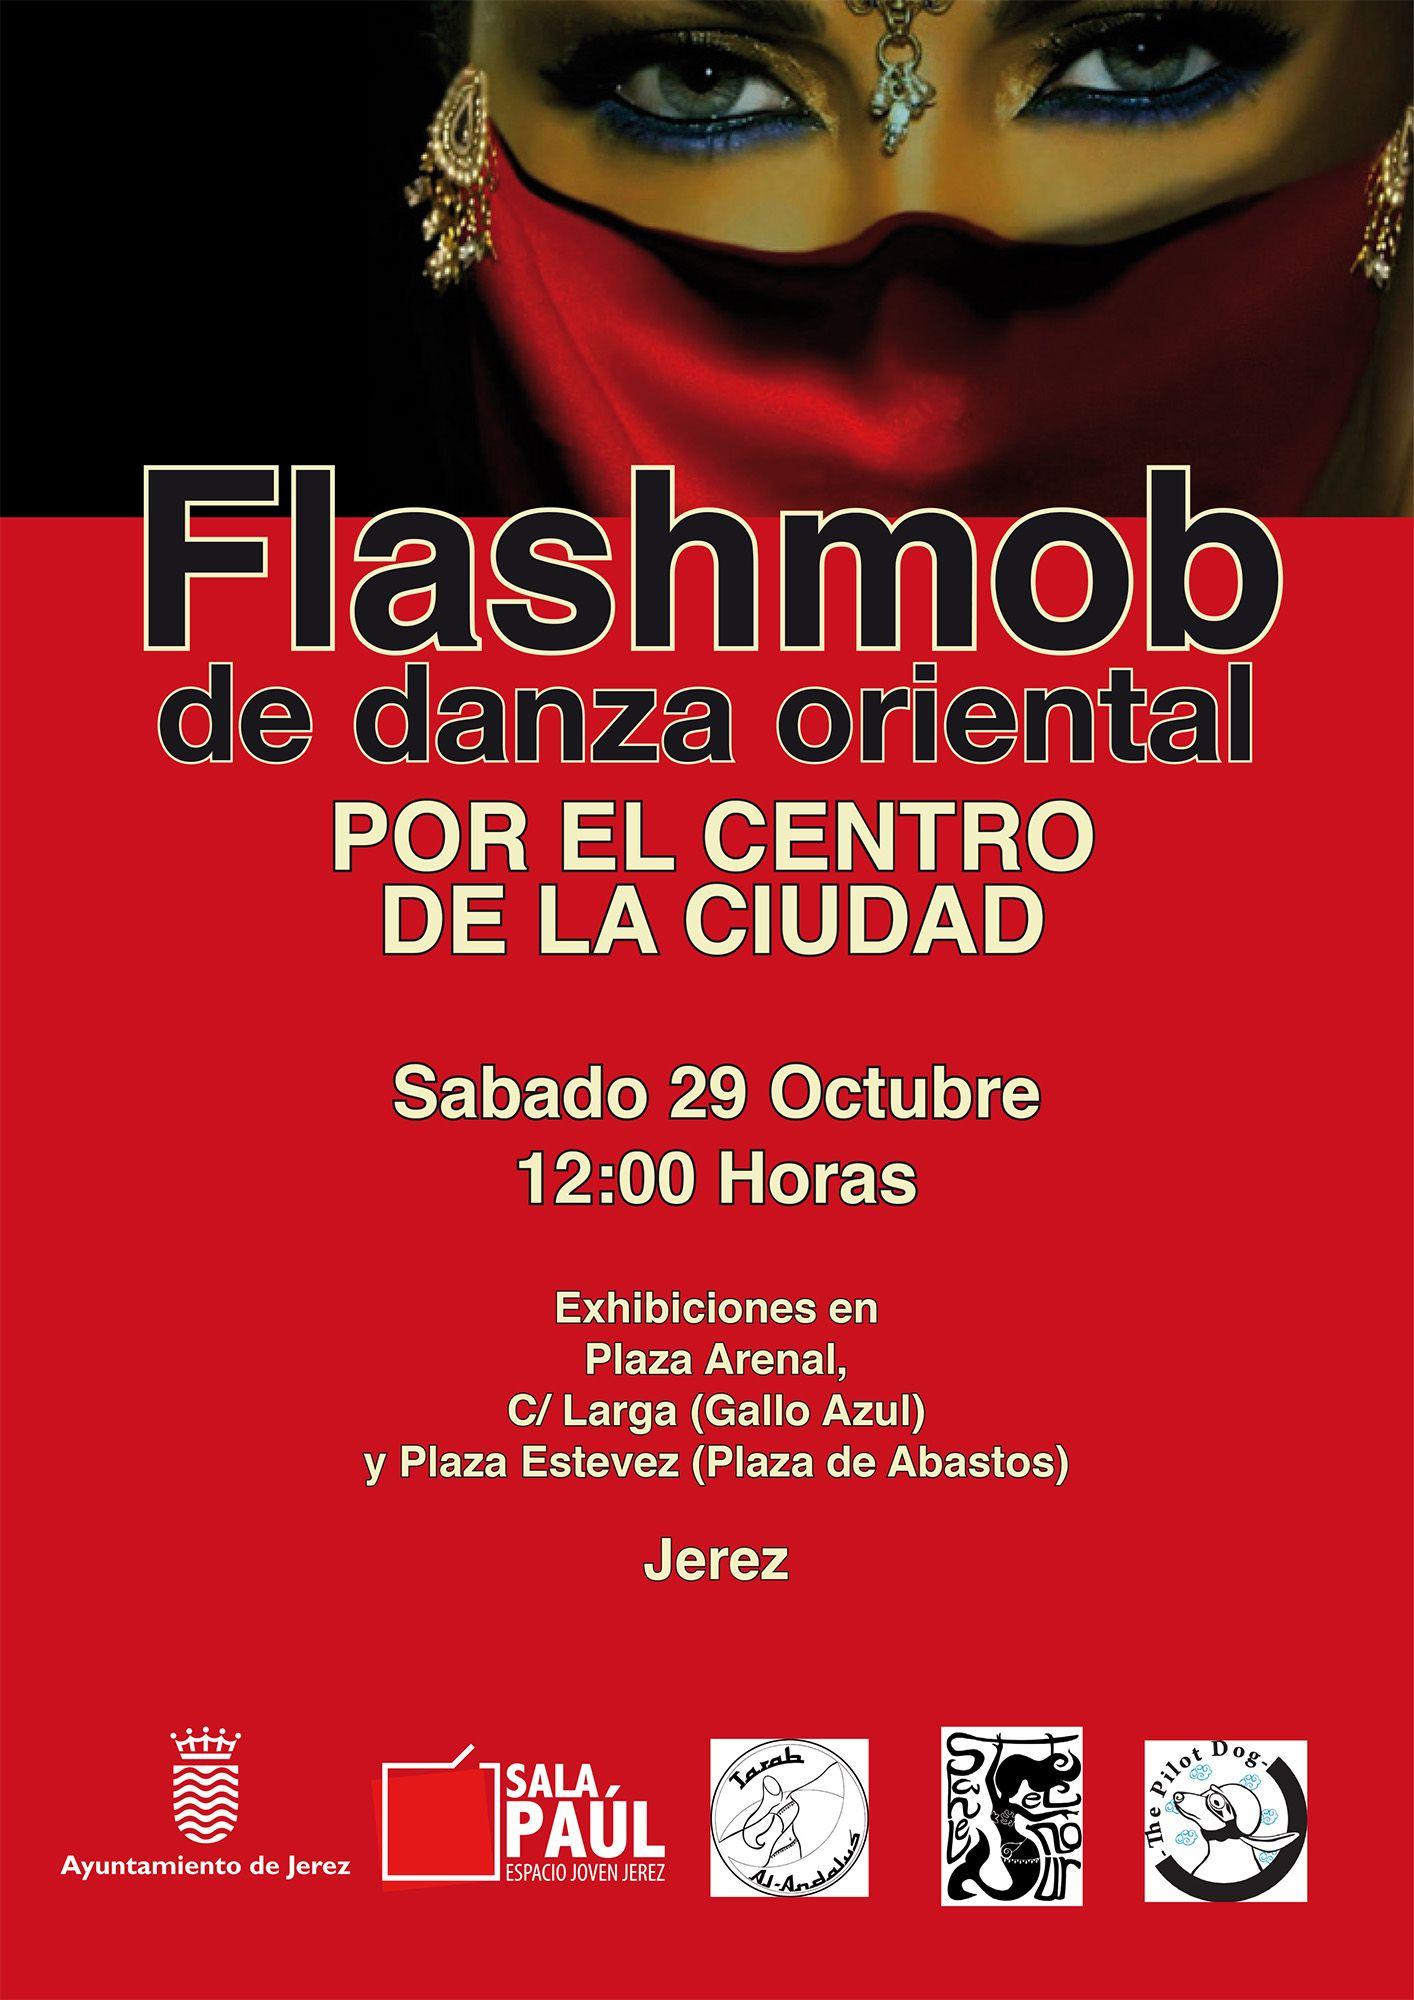 cartel-flashmob-danza-oriental